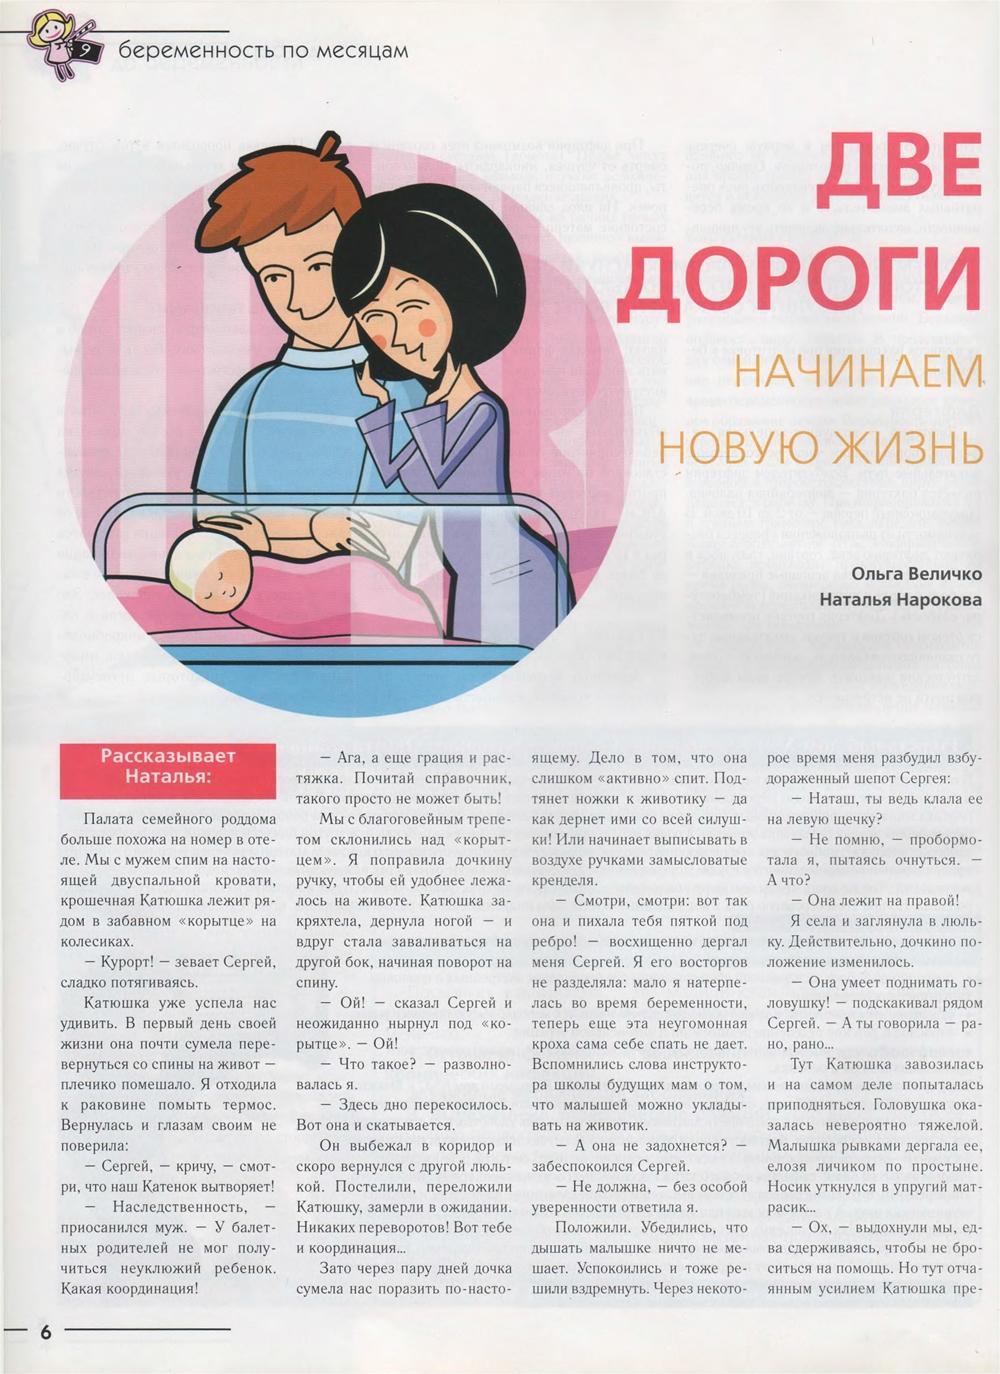 http://i5.imageban.ru/out/2013/10/30/5ef70cddf066a3adccbe403d6fe55579.jpg